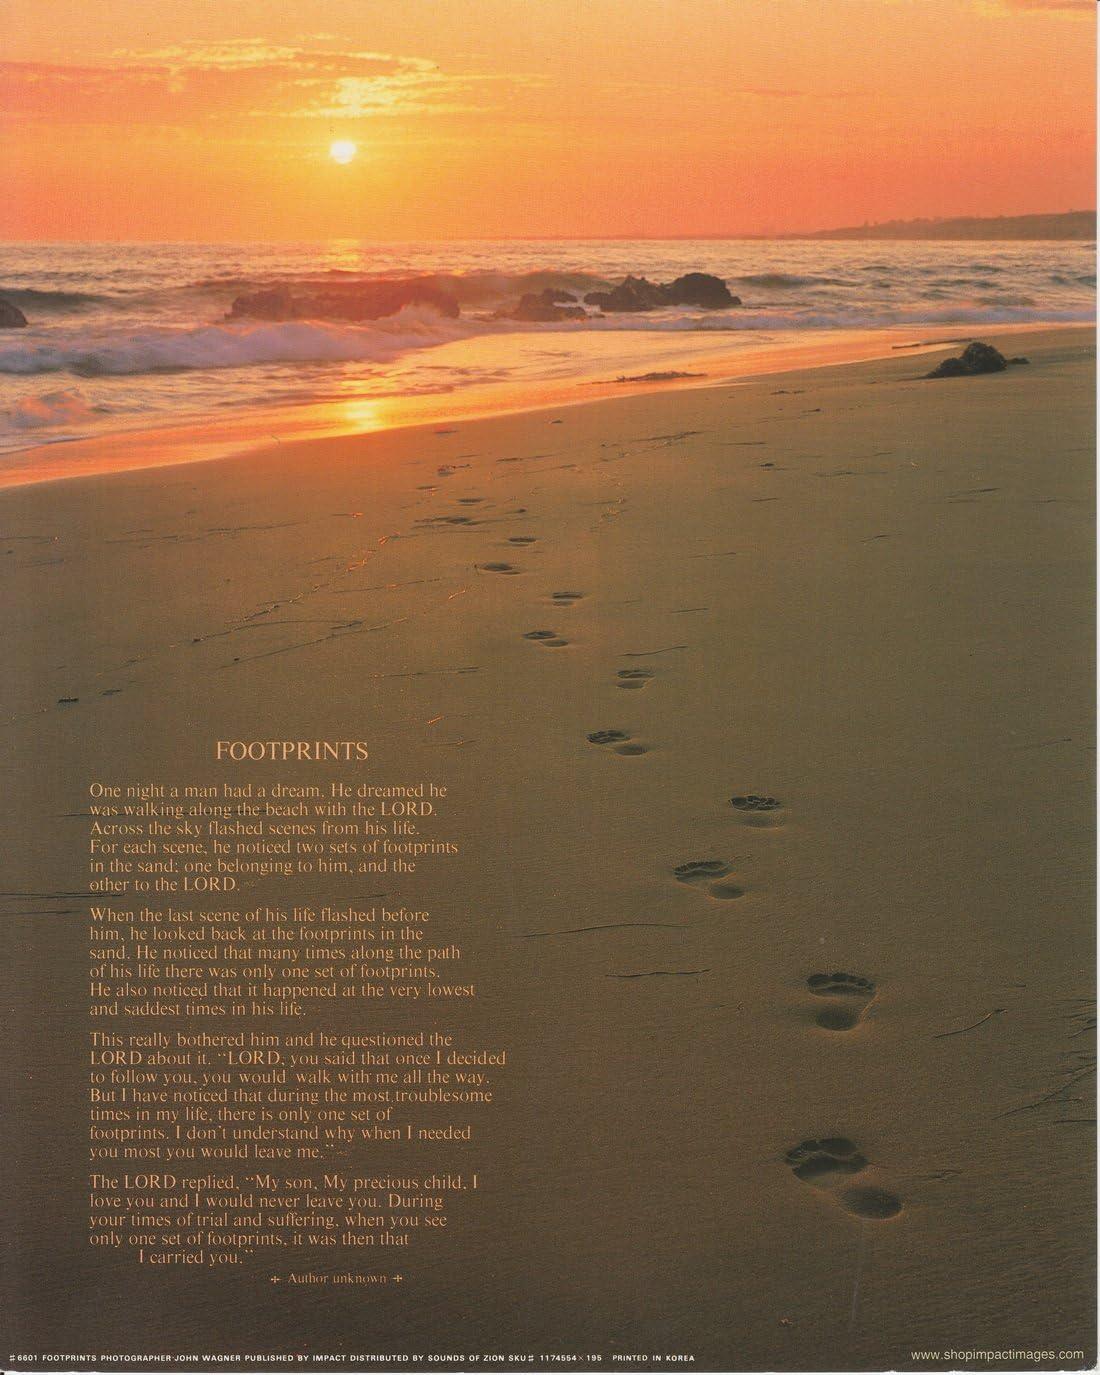 Footprints Poster in the Sand Motivational Wall Decor Art Print (16x20)